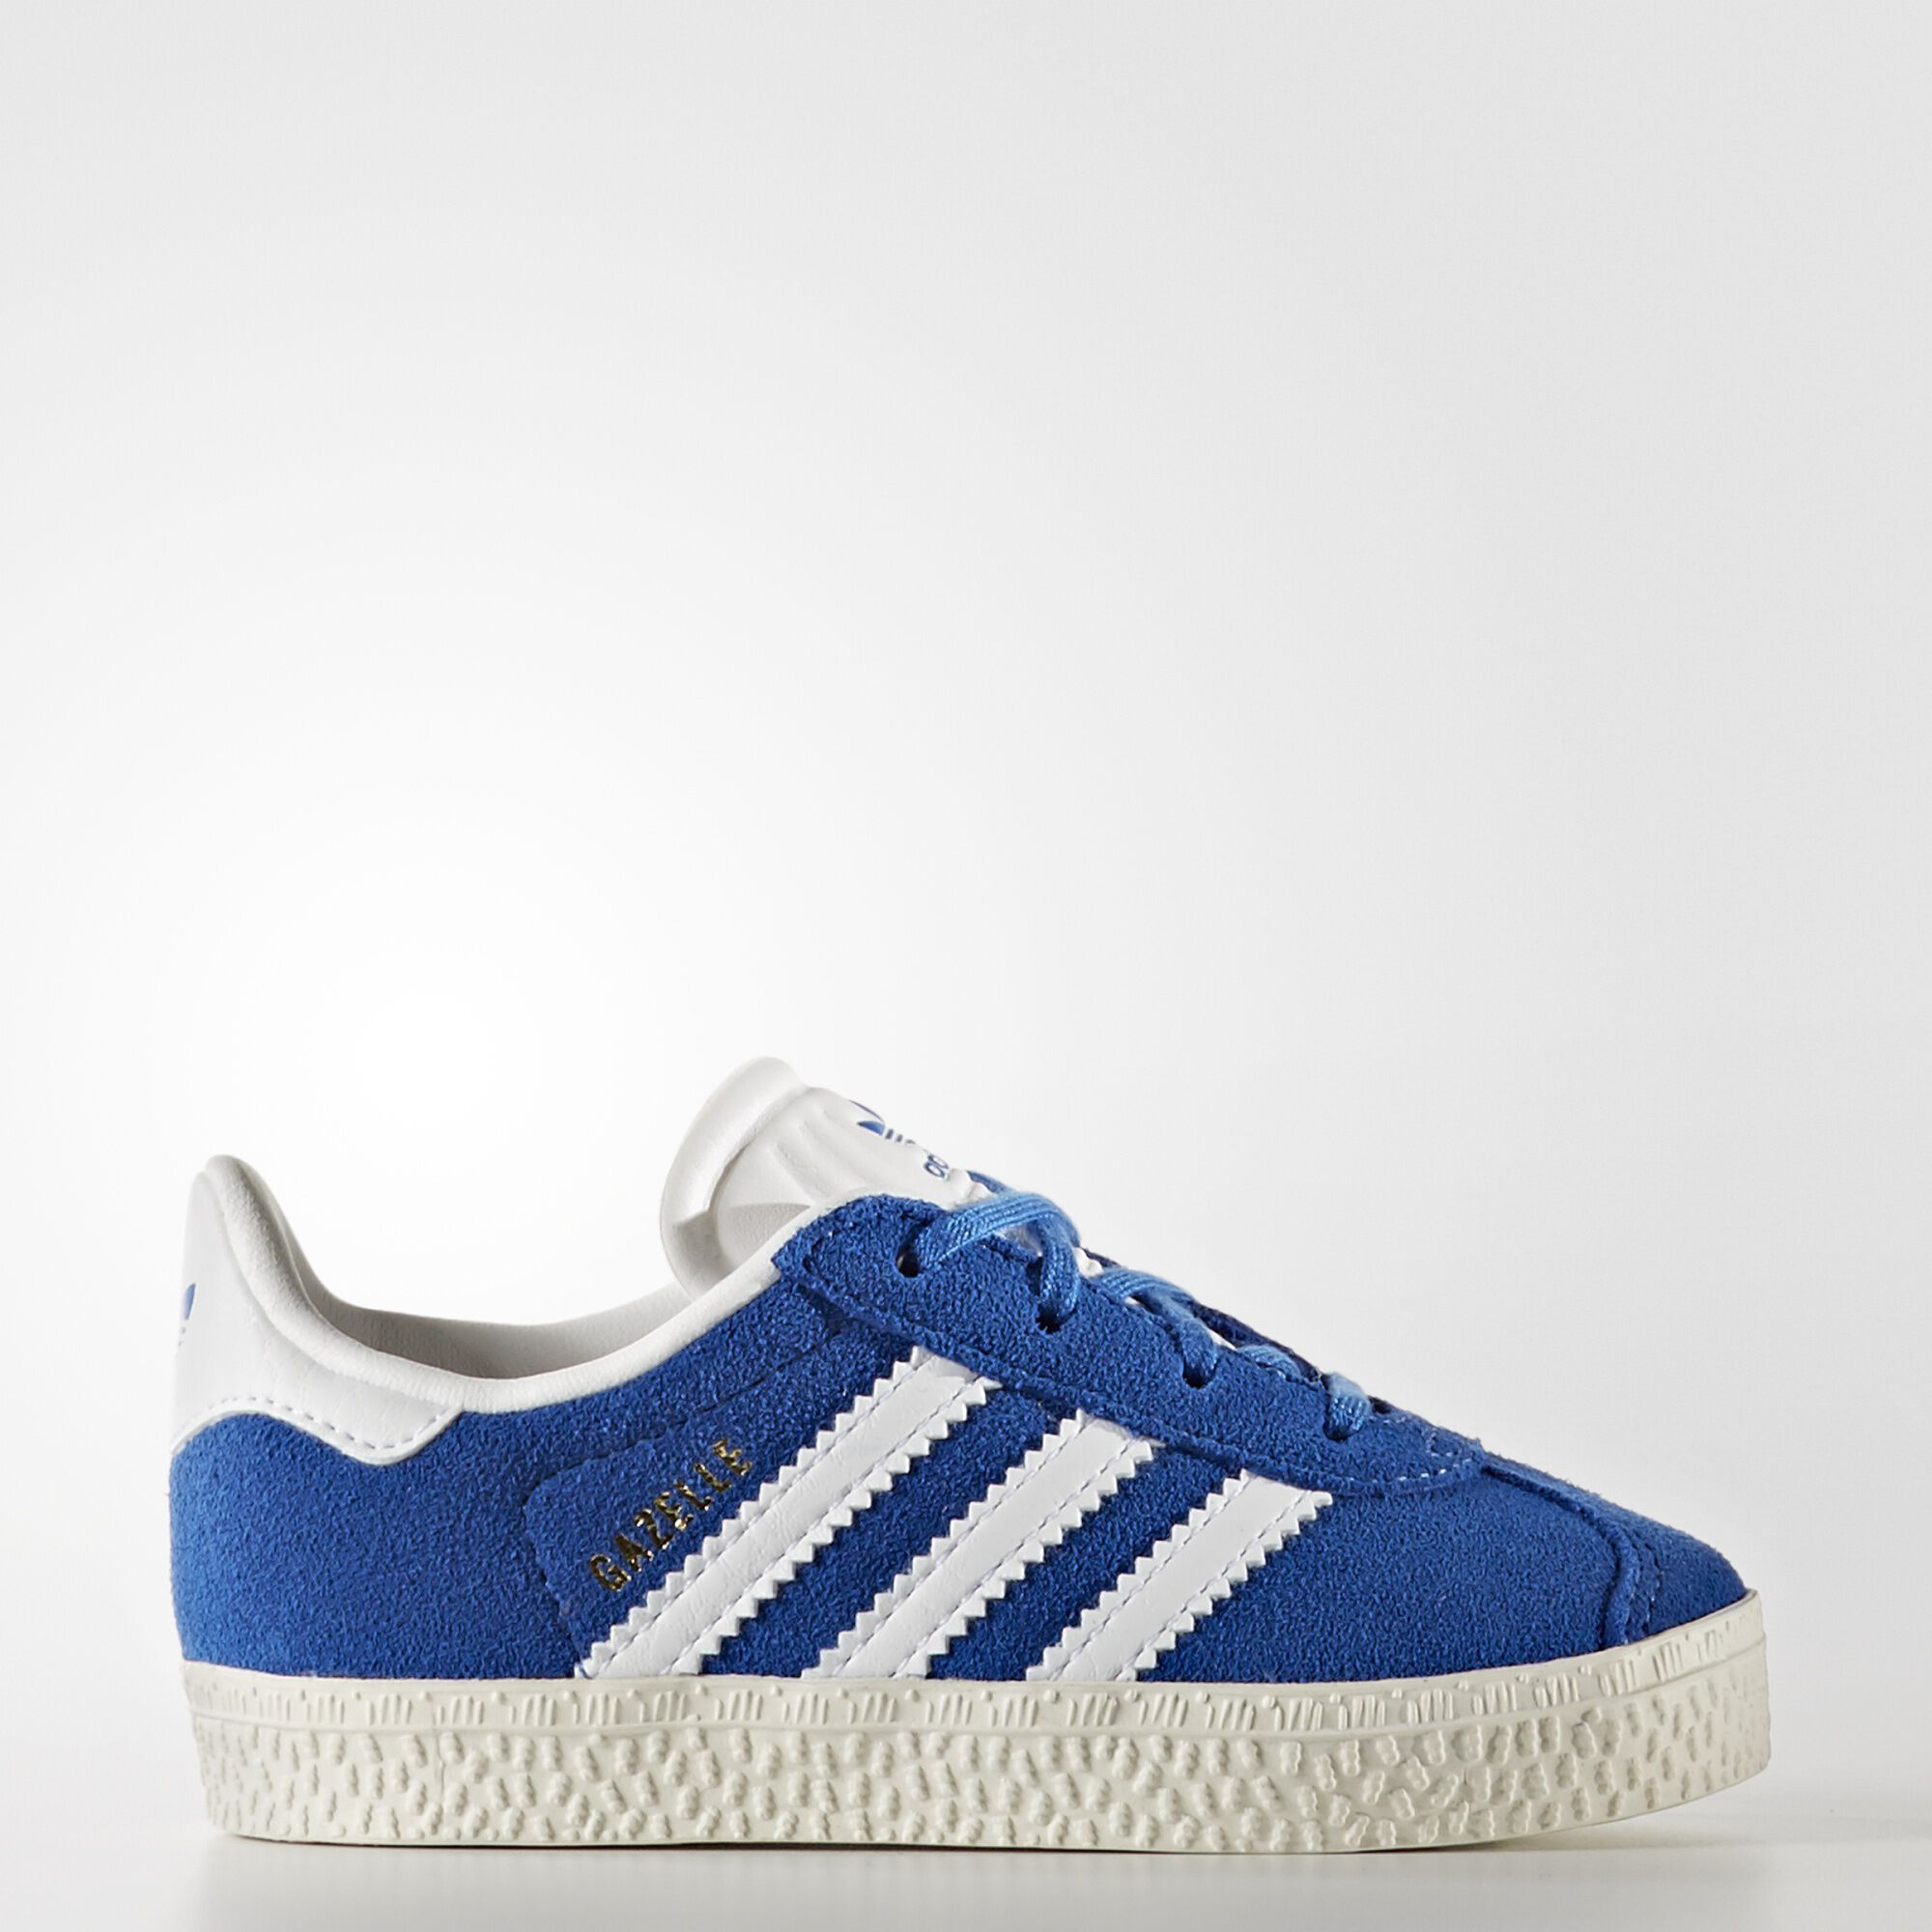 adidas gazelle navy blue,cheap adidas soccer shoes > OFF58